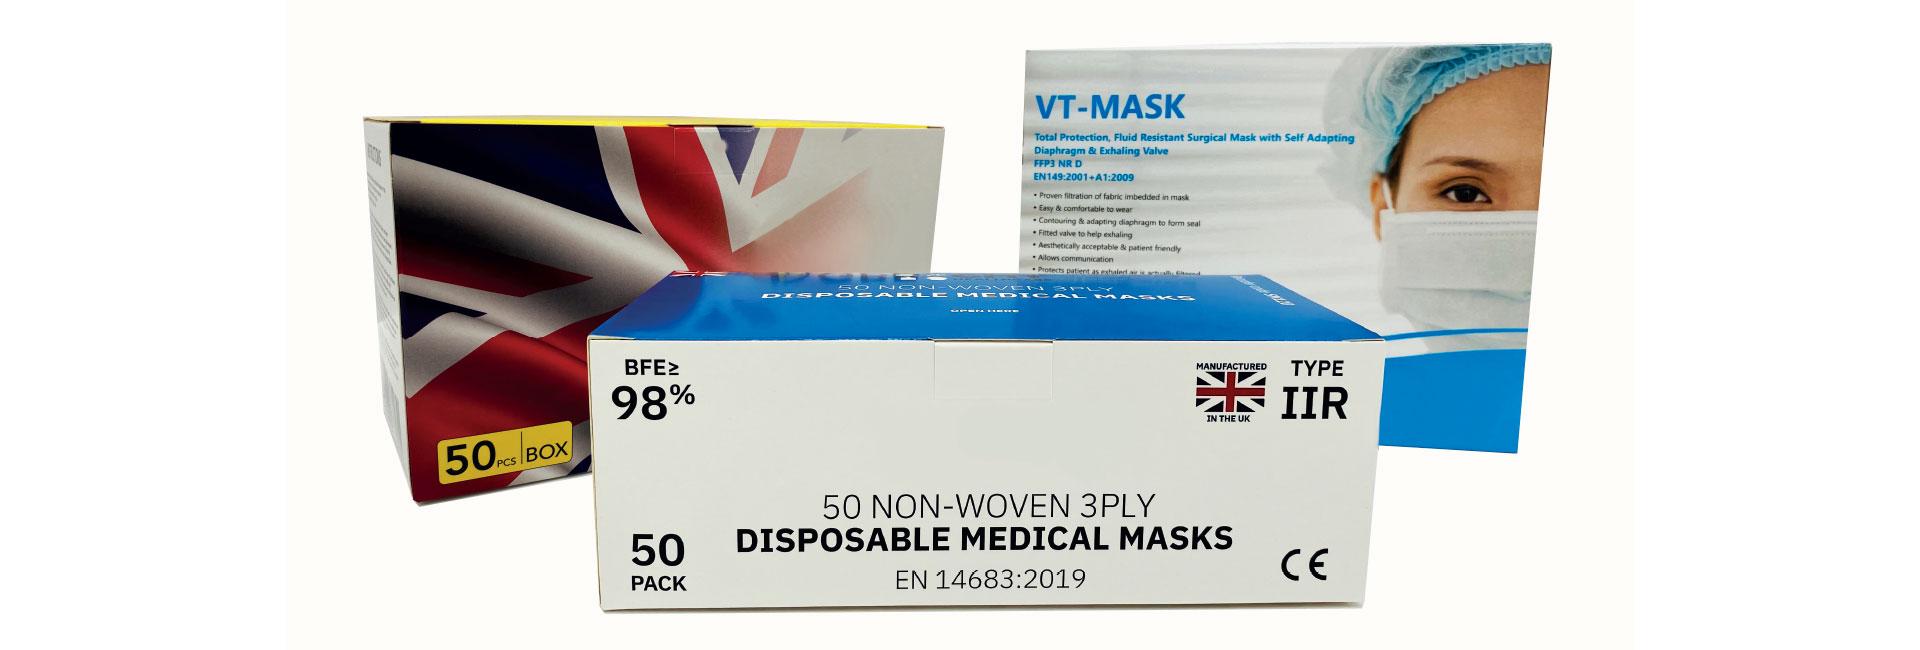 PPE packaging